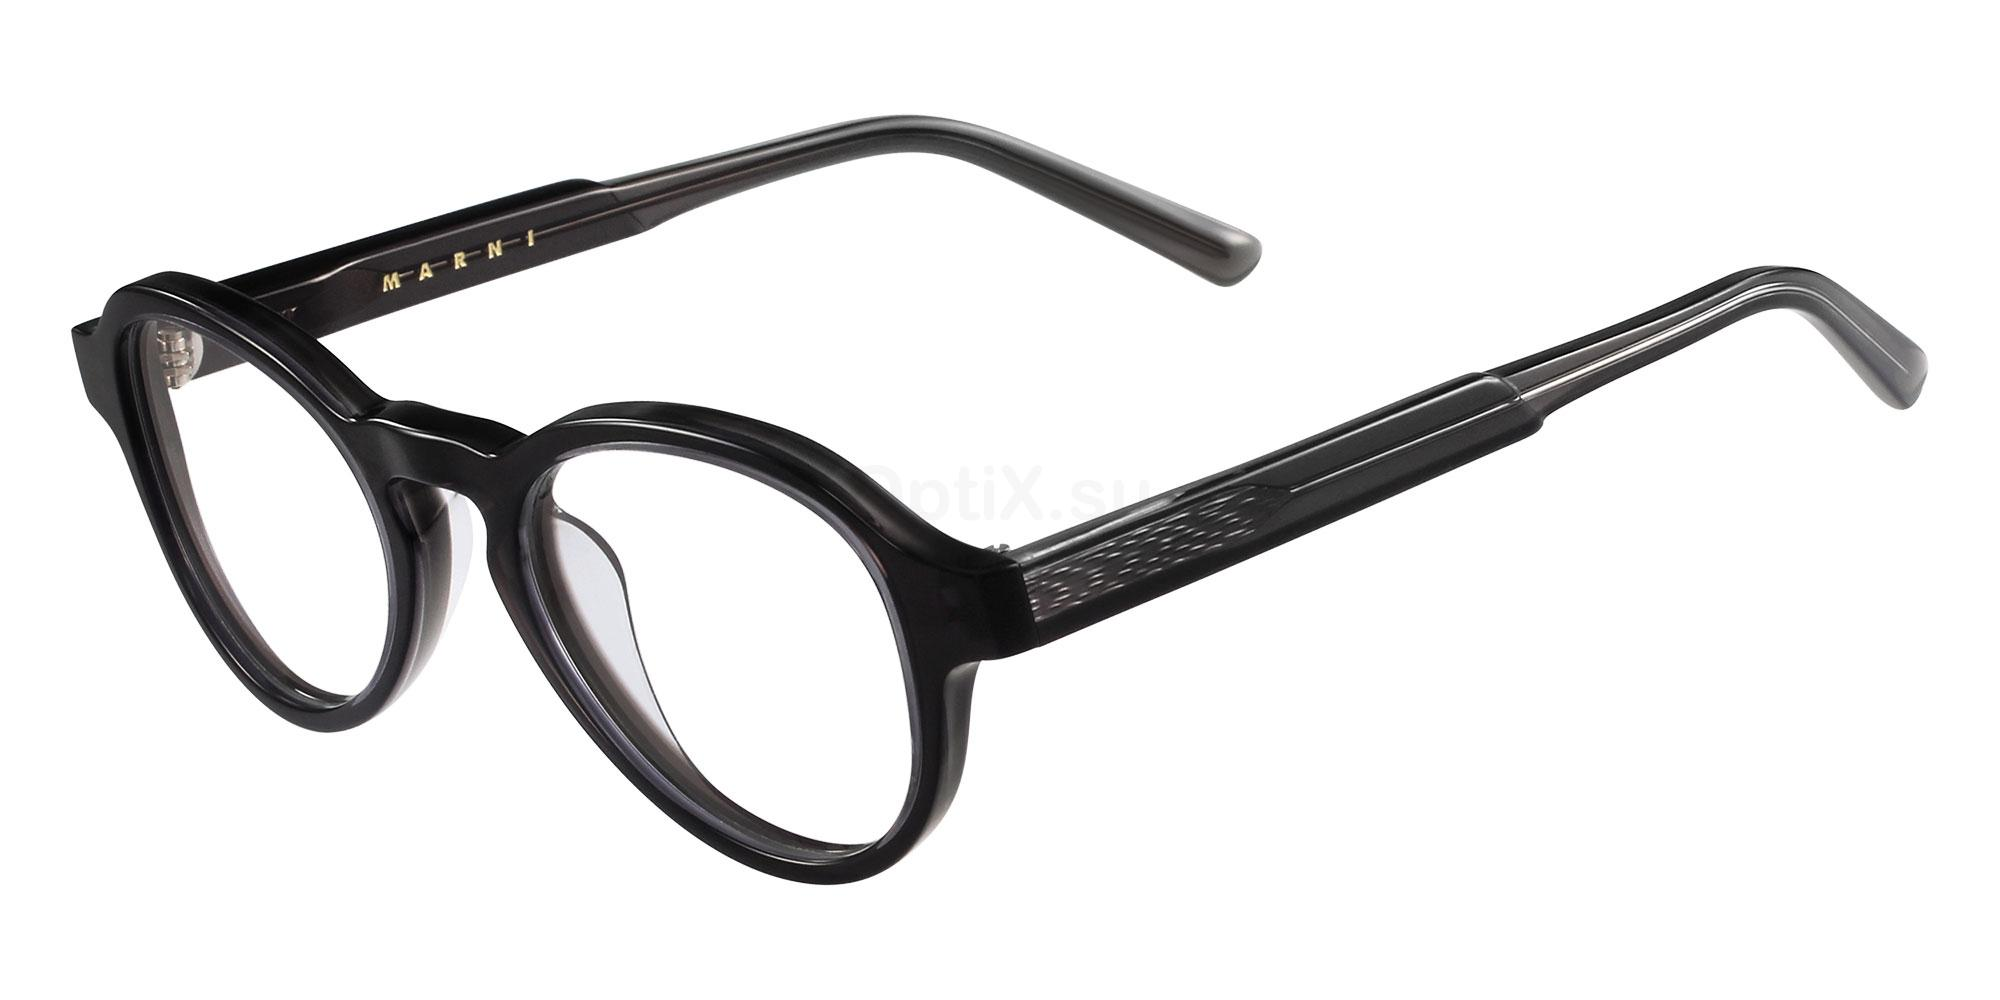 003 ME2602 Glasses, Marni